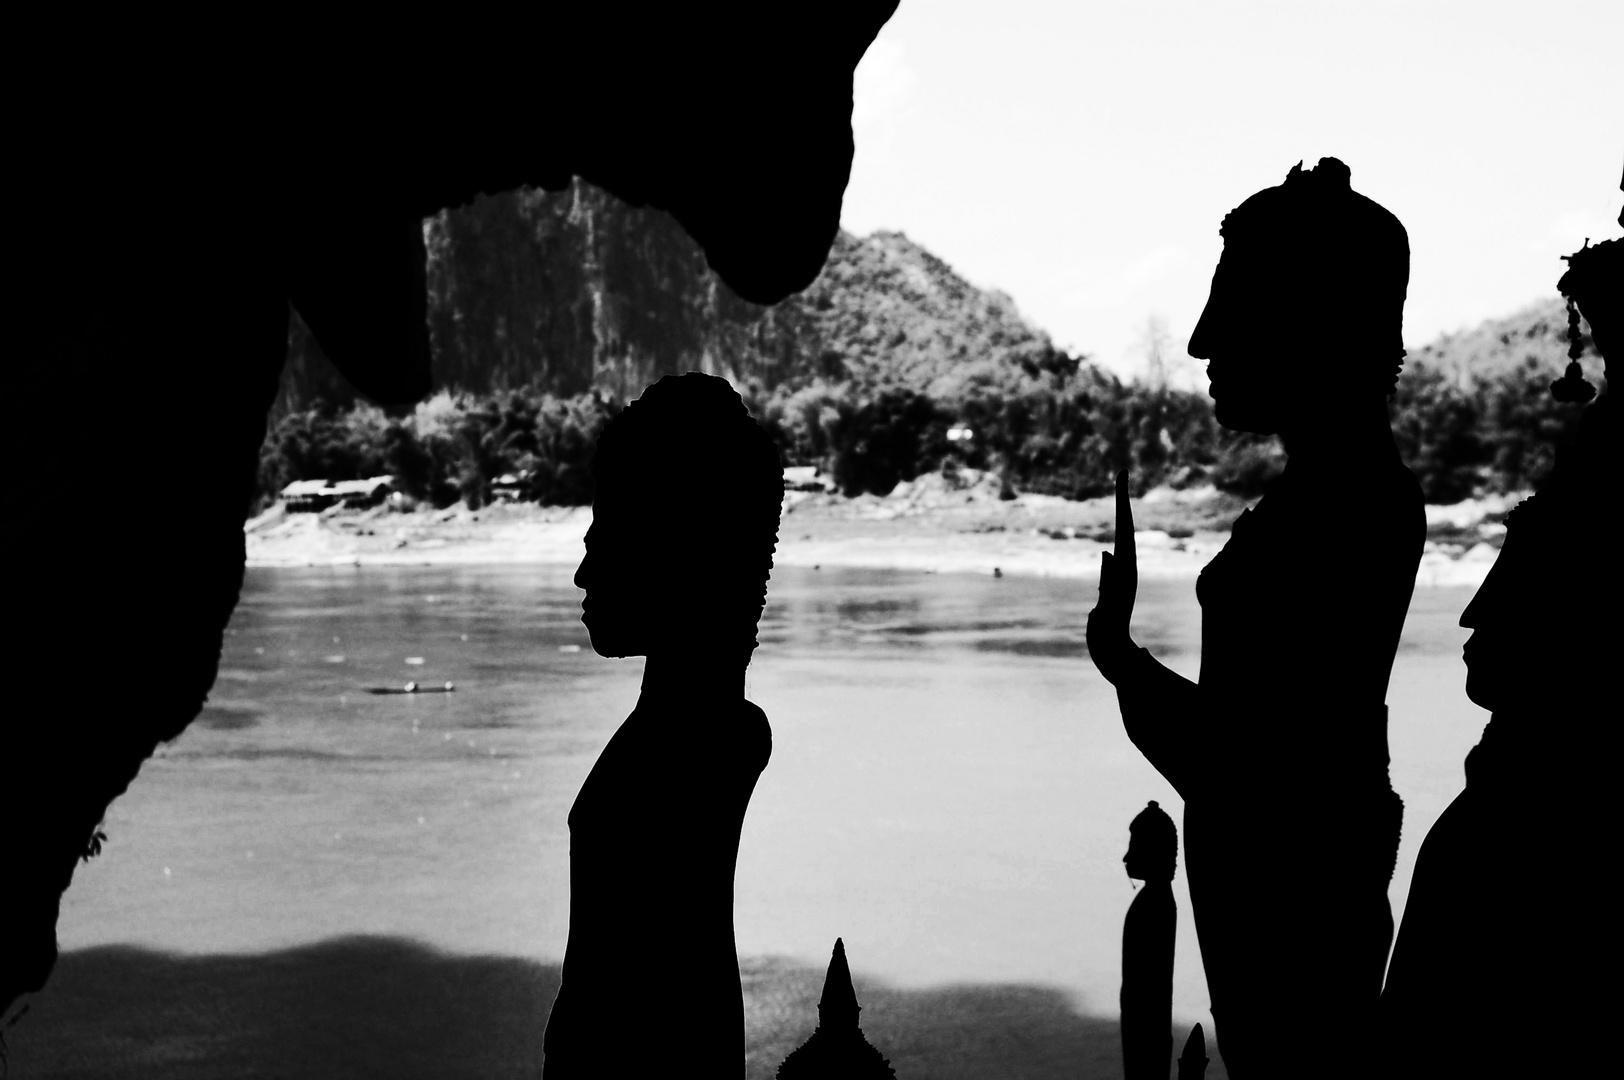 Grotte de Pak Ou, Nord Laos